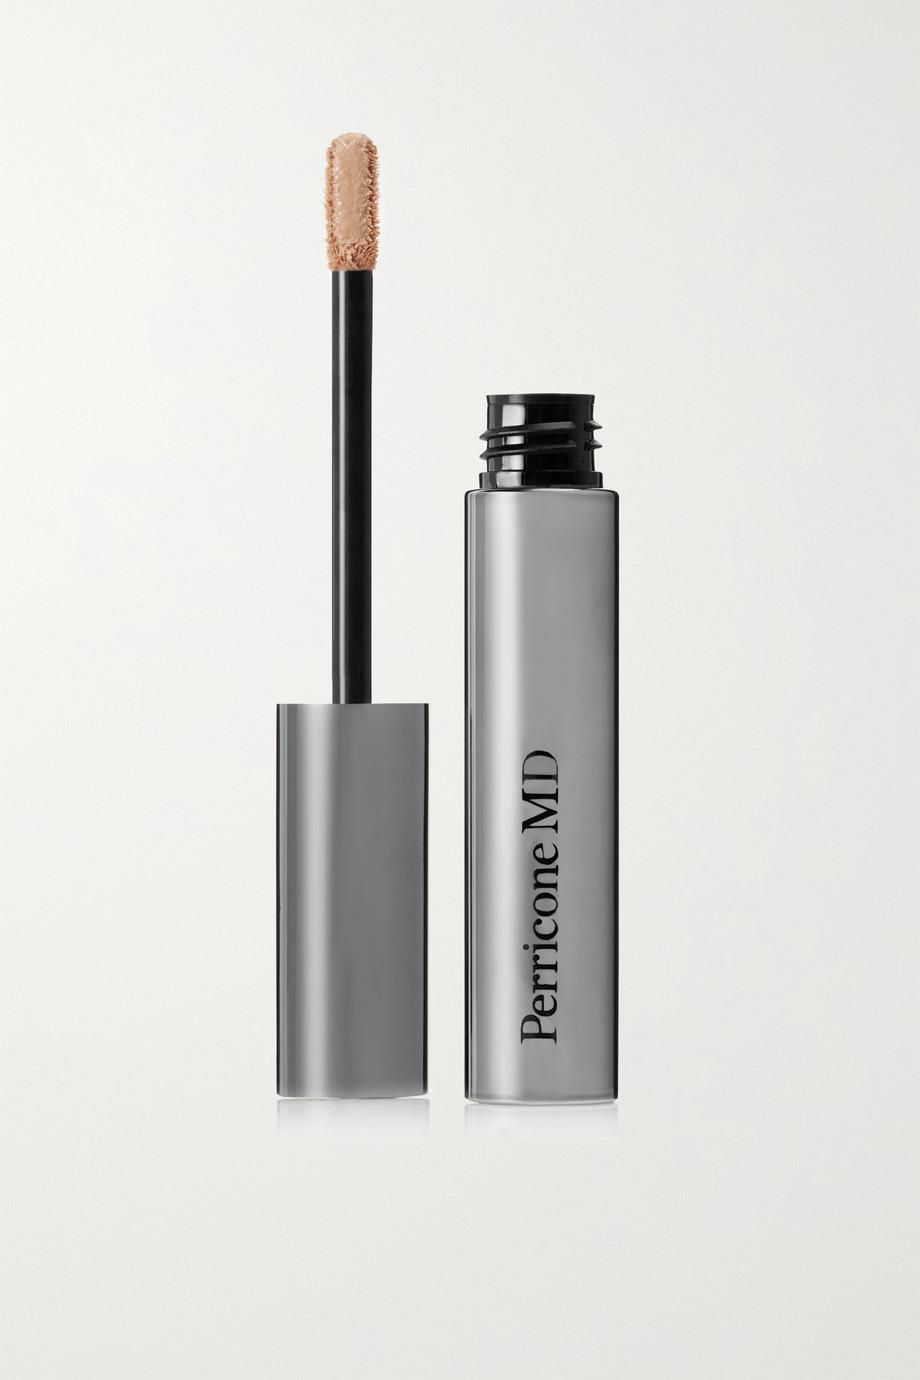 Perricone MD No Makeup Concealer Broad Spectrum SPF20 - Light, 10ml